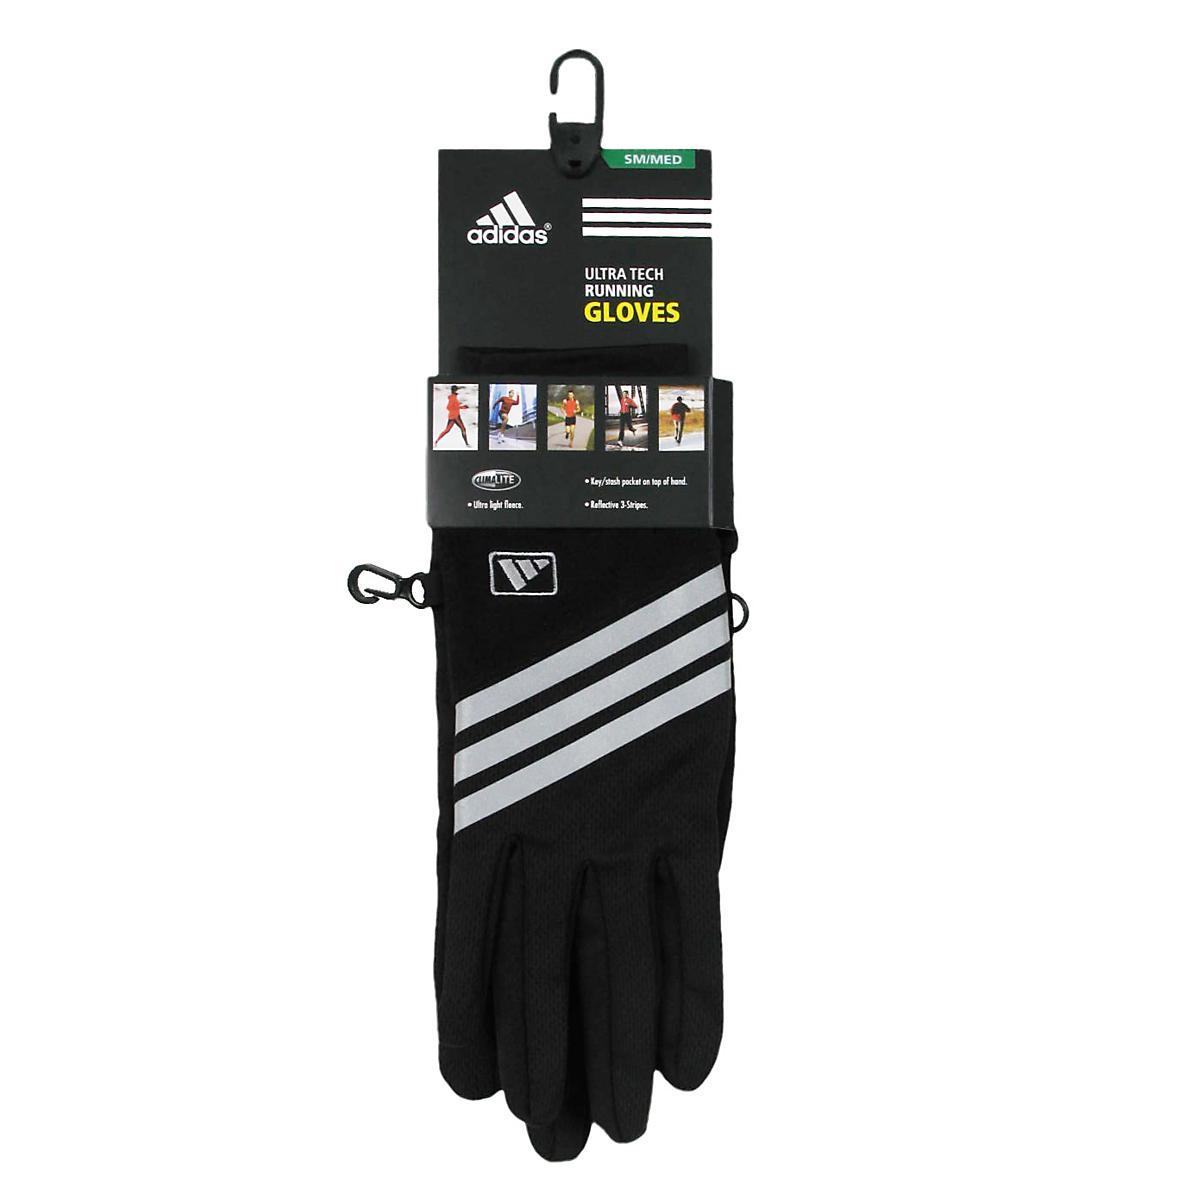 Ultra Tech Products : Adidas ultratech running glove handwear at road runner sports